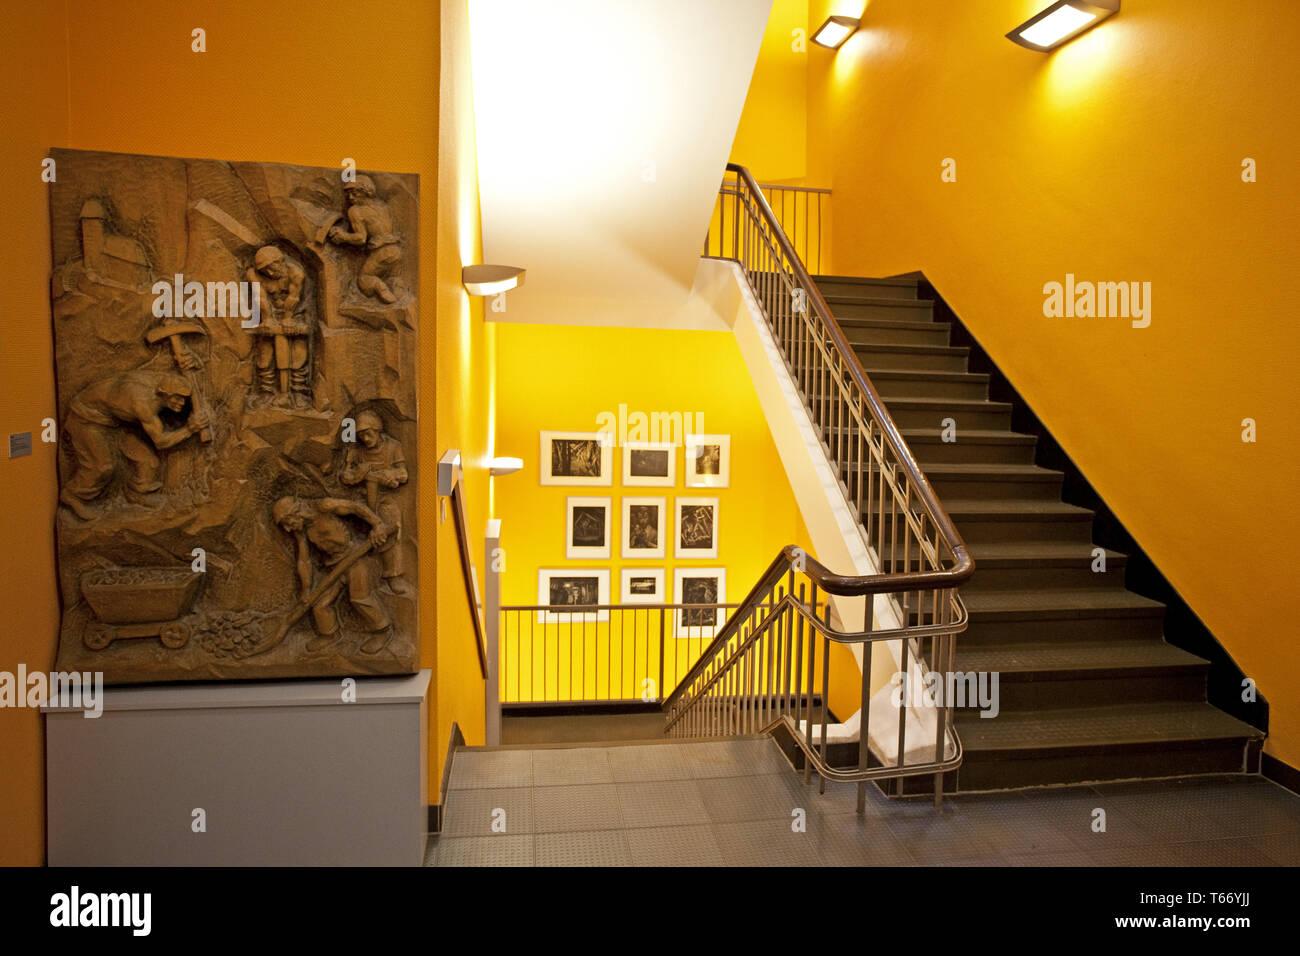 Founders and entrepreneurs Museum, Muelheim, Ruhr area, Germany, Europe - Stock Image